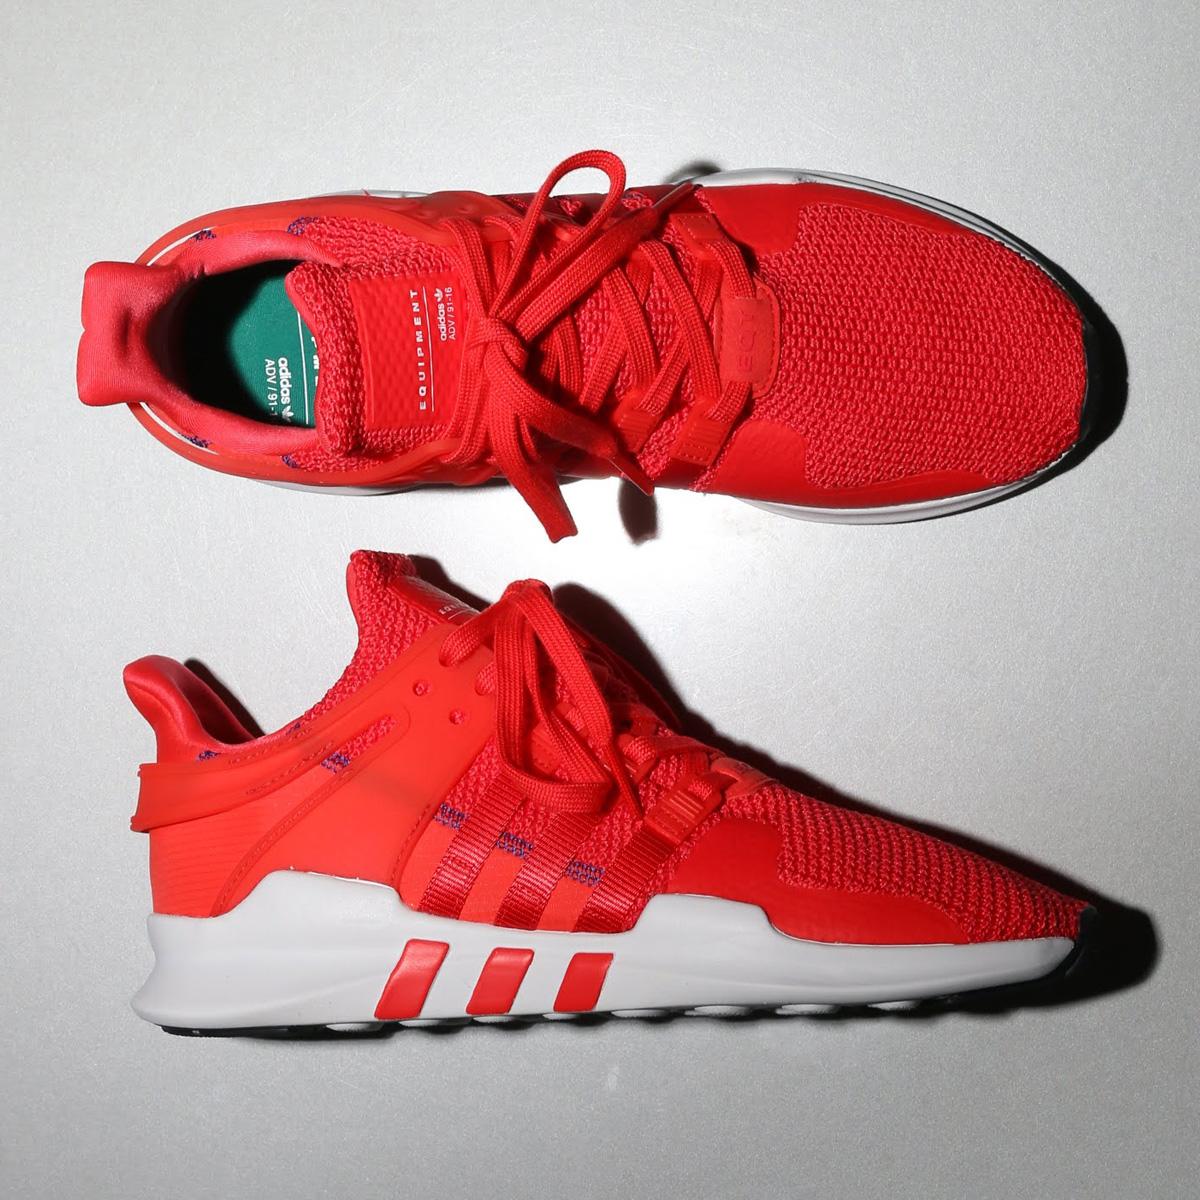 adidas Originals EQT SUPPORT ADV (アディダス オリジナルス イーキューティー サポート ADV) real coral/real coral/ftwr white【メンズ スニーカー】18SS-S